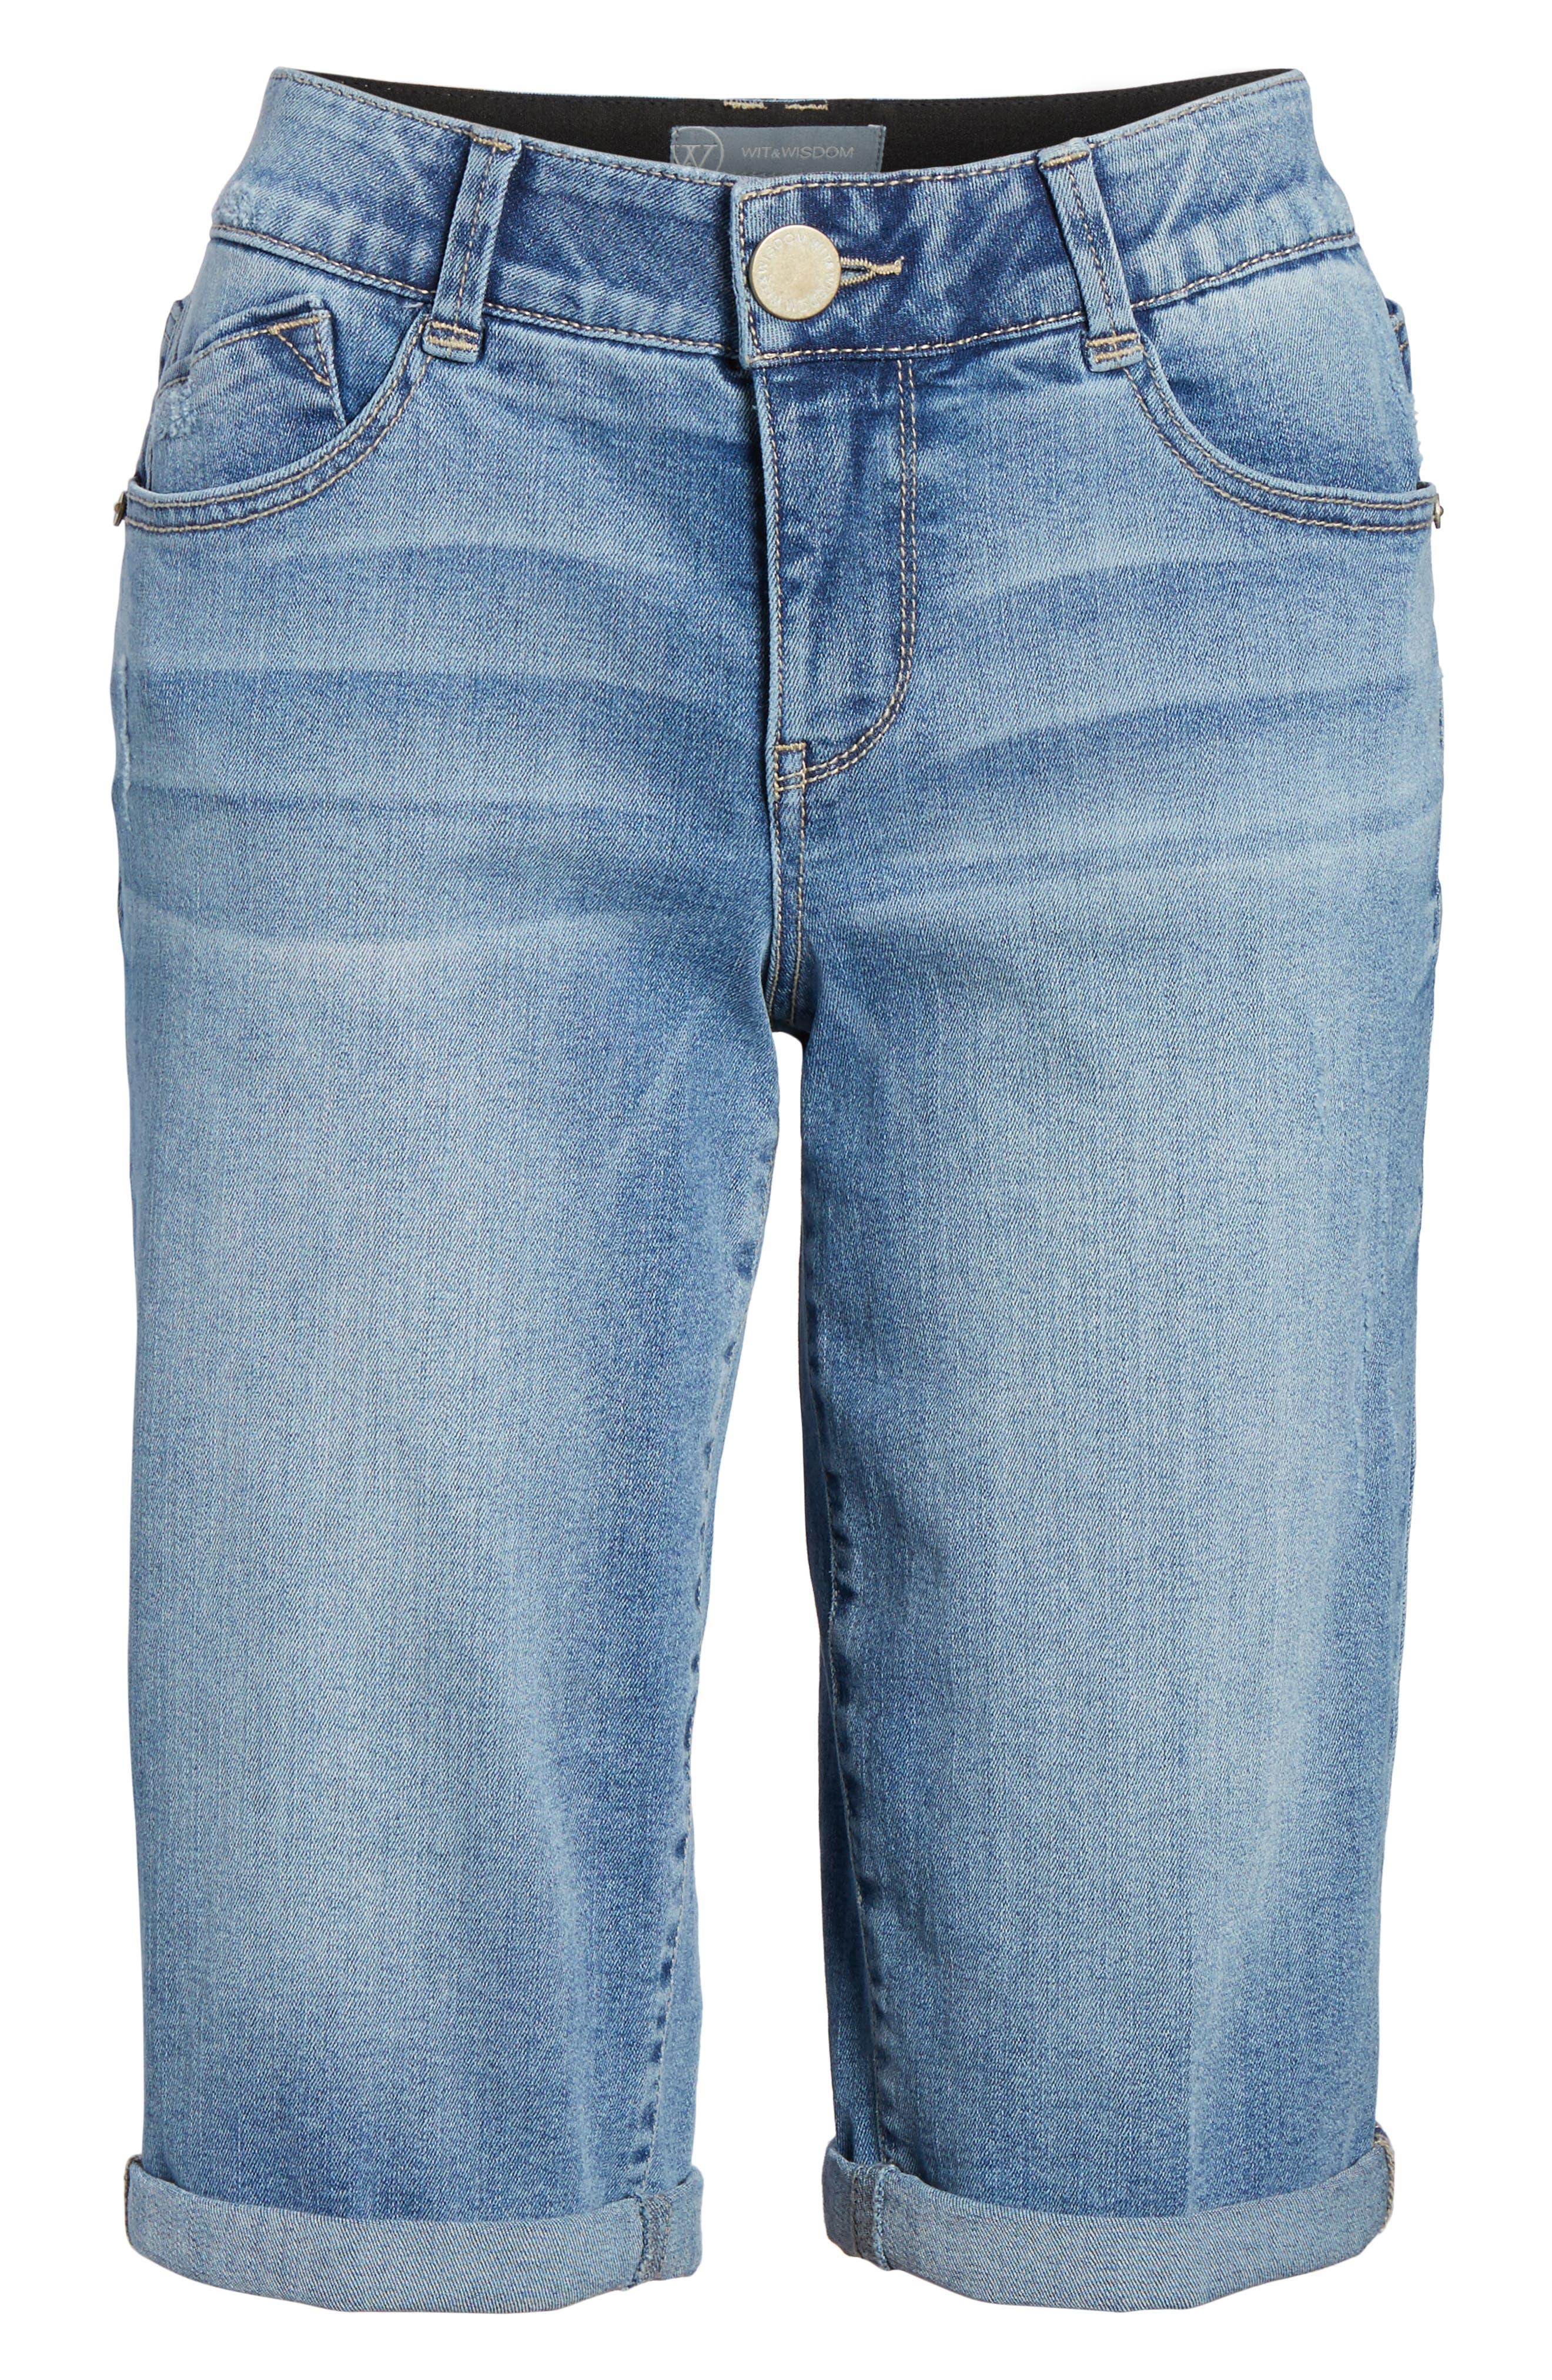 Ab-solution Cuffed Denim Shorts,                             Alternate thumbnail 7, color,                             LIGHT BLUE